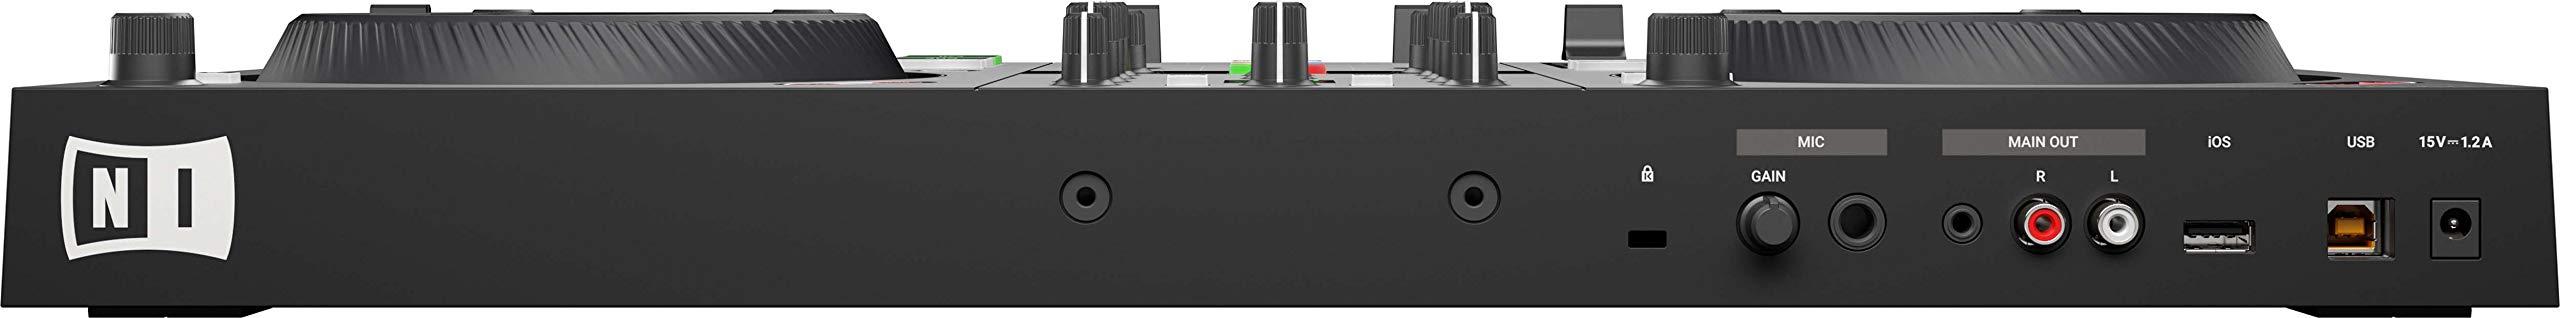 Native Instruments Traktor Kontrol S2 Mk3 DJ Controller by Native Instruments (Image #5)